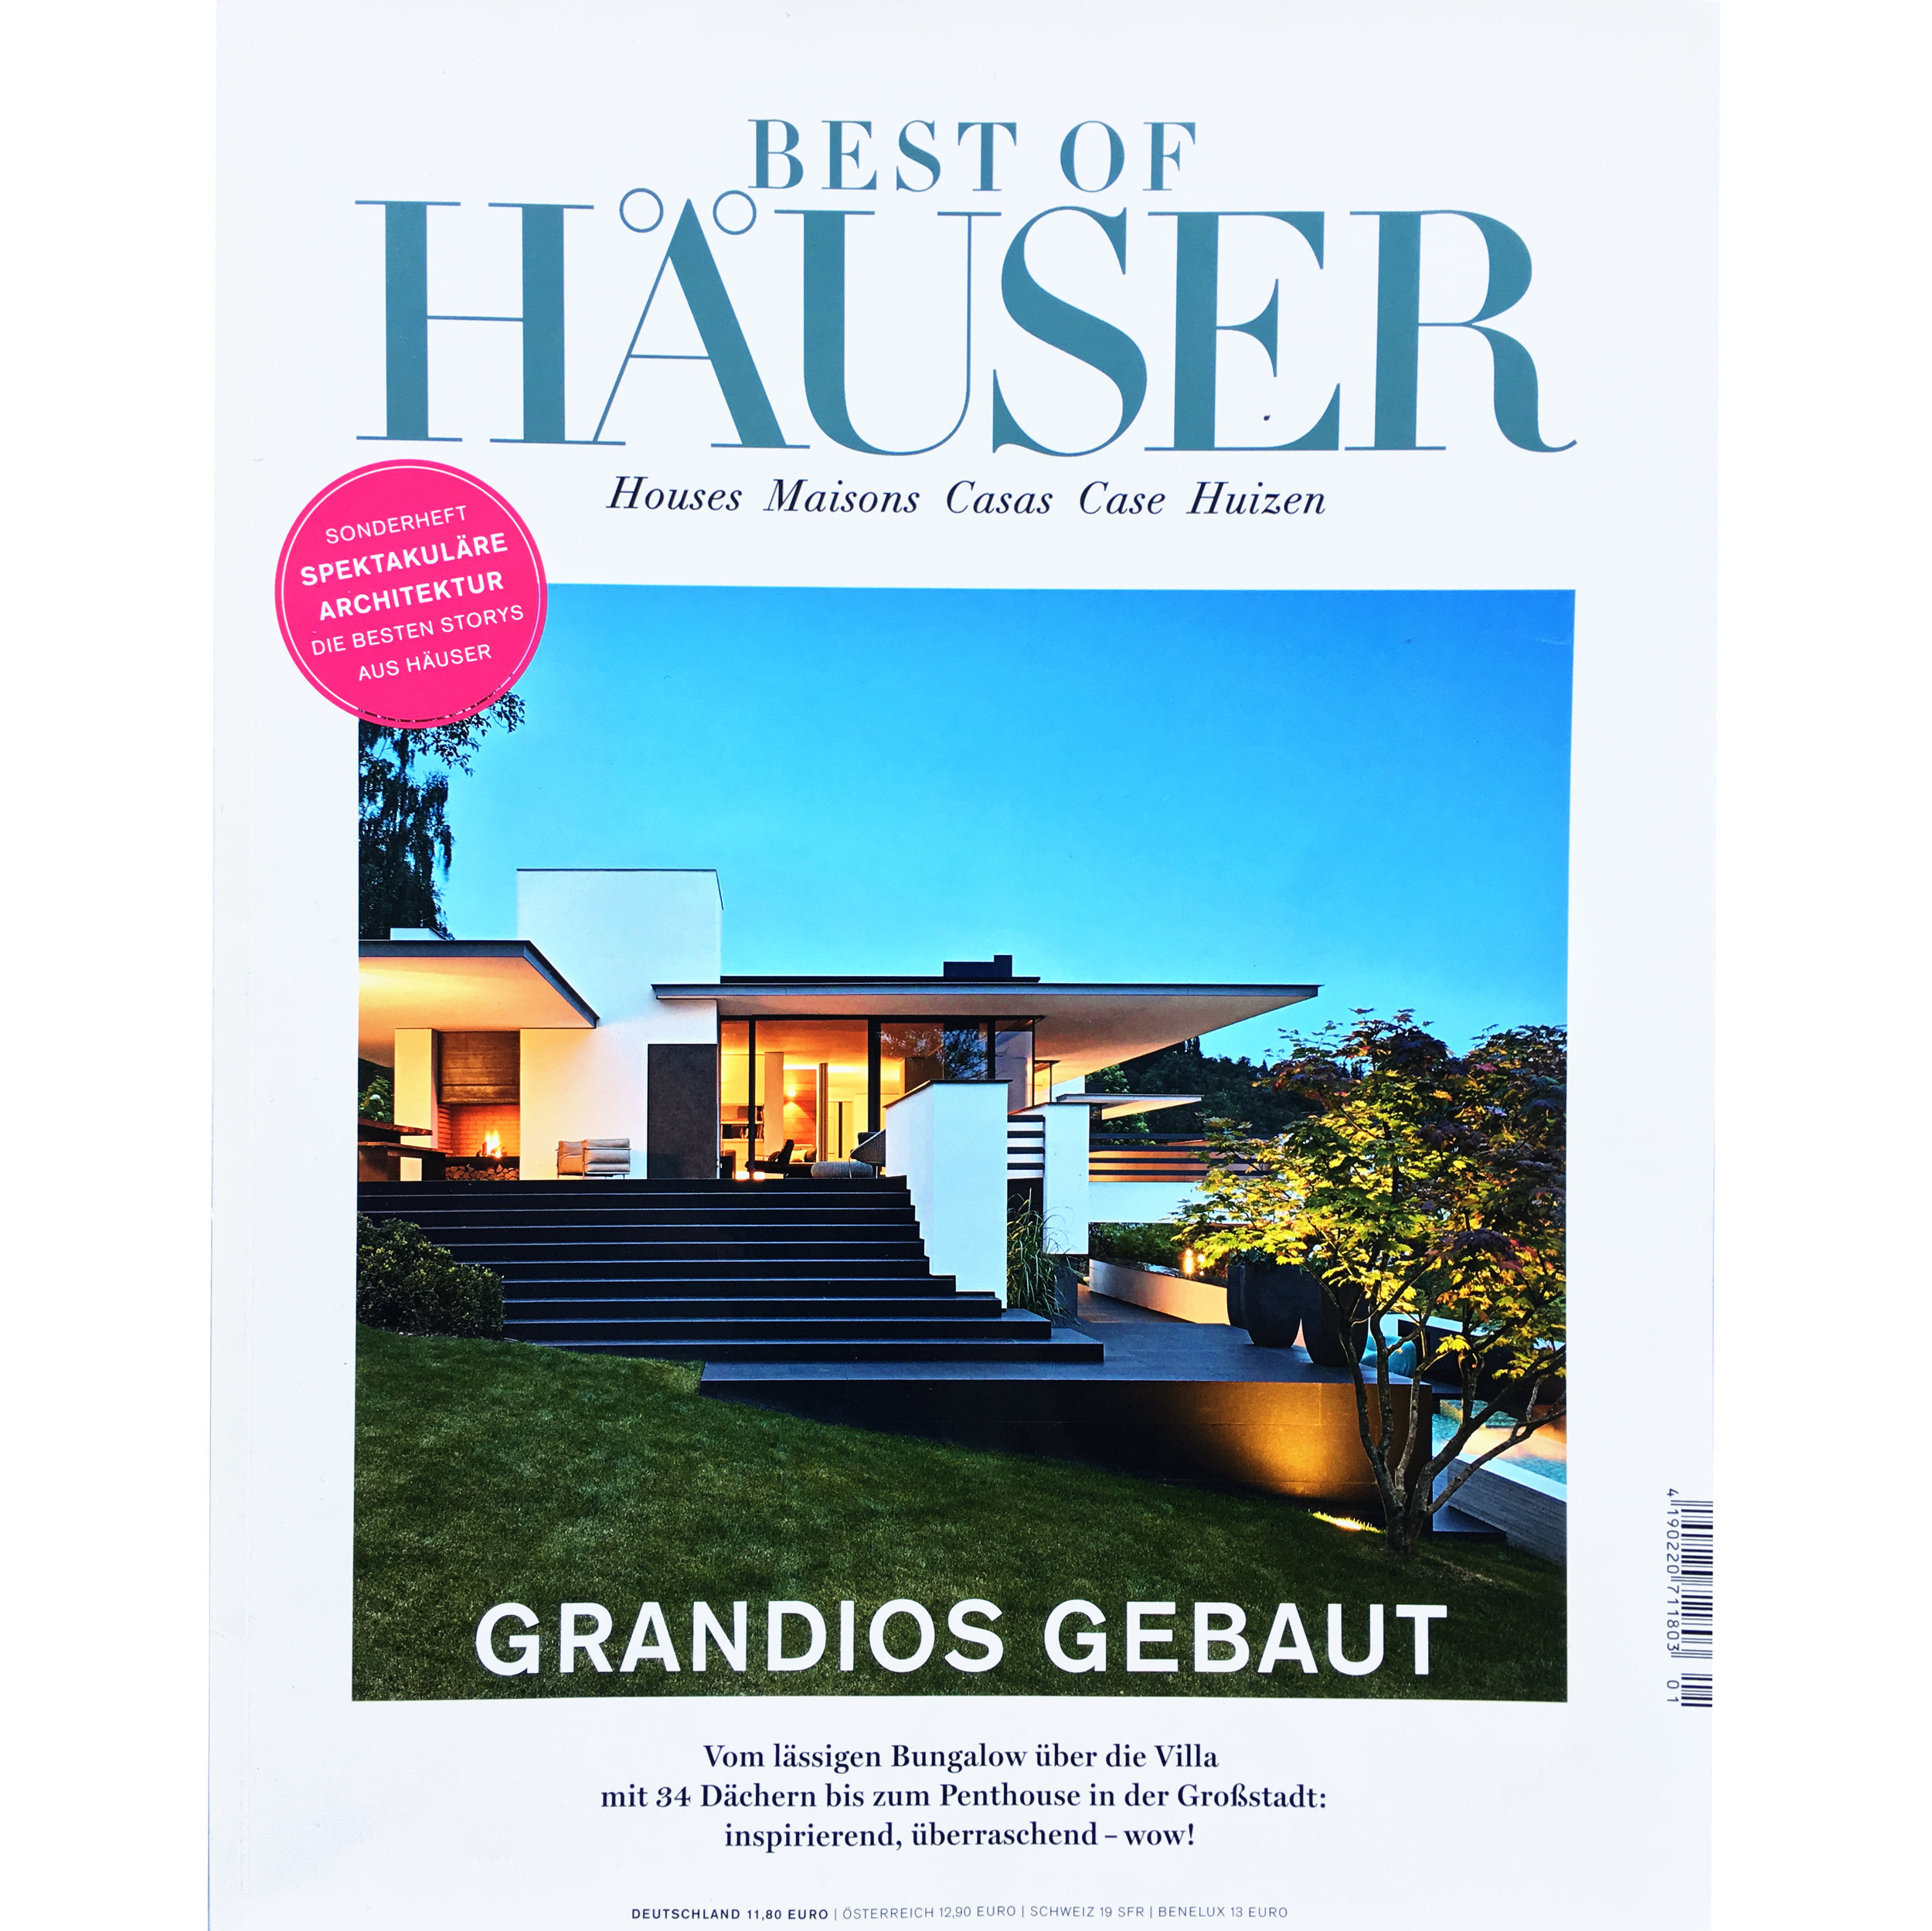 Best of Häuser. 2016 (Printed Publication)